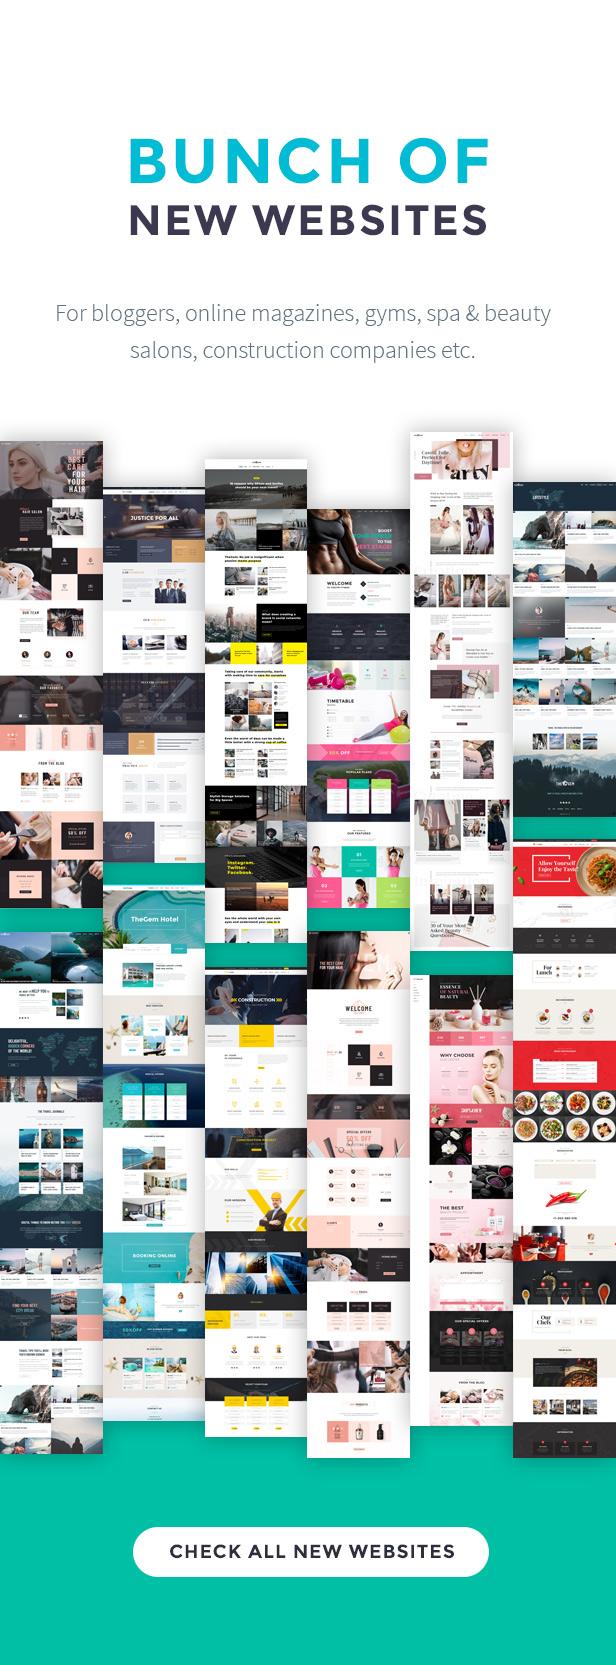 4 7 new - TheGem - Creative Multi-Purpose High-Performance WordPress Theme